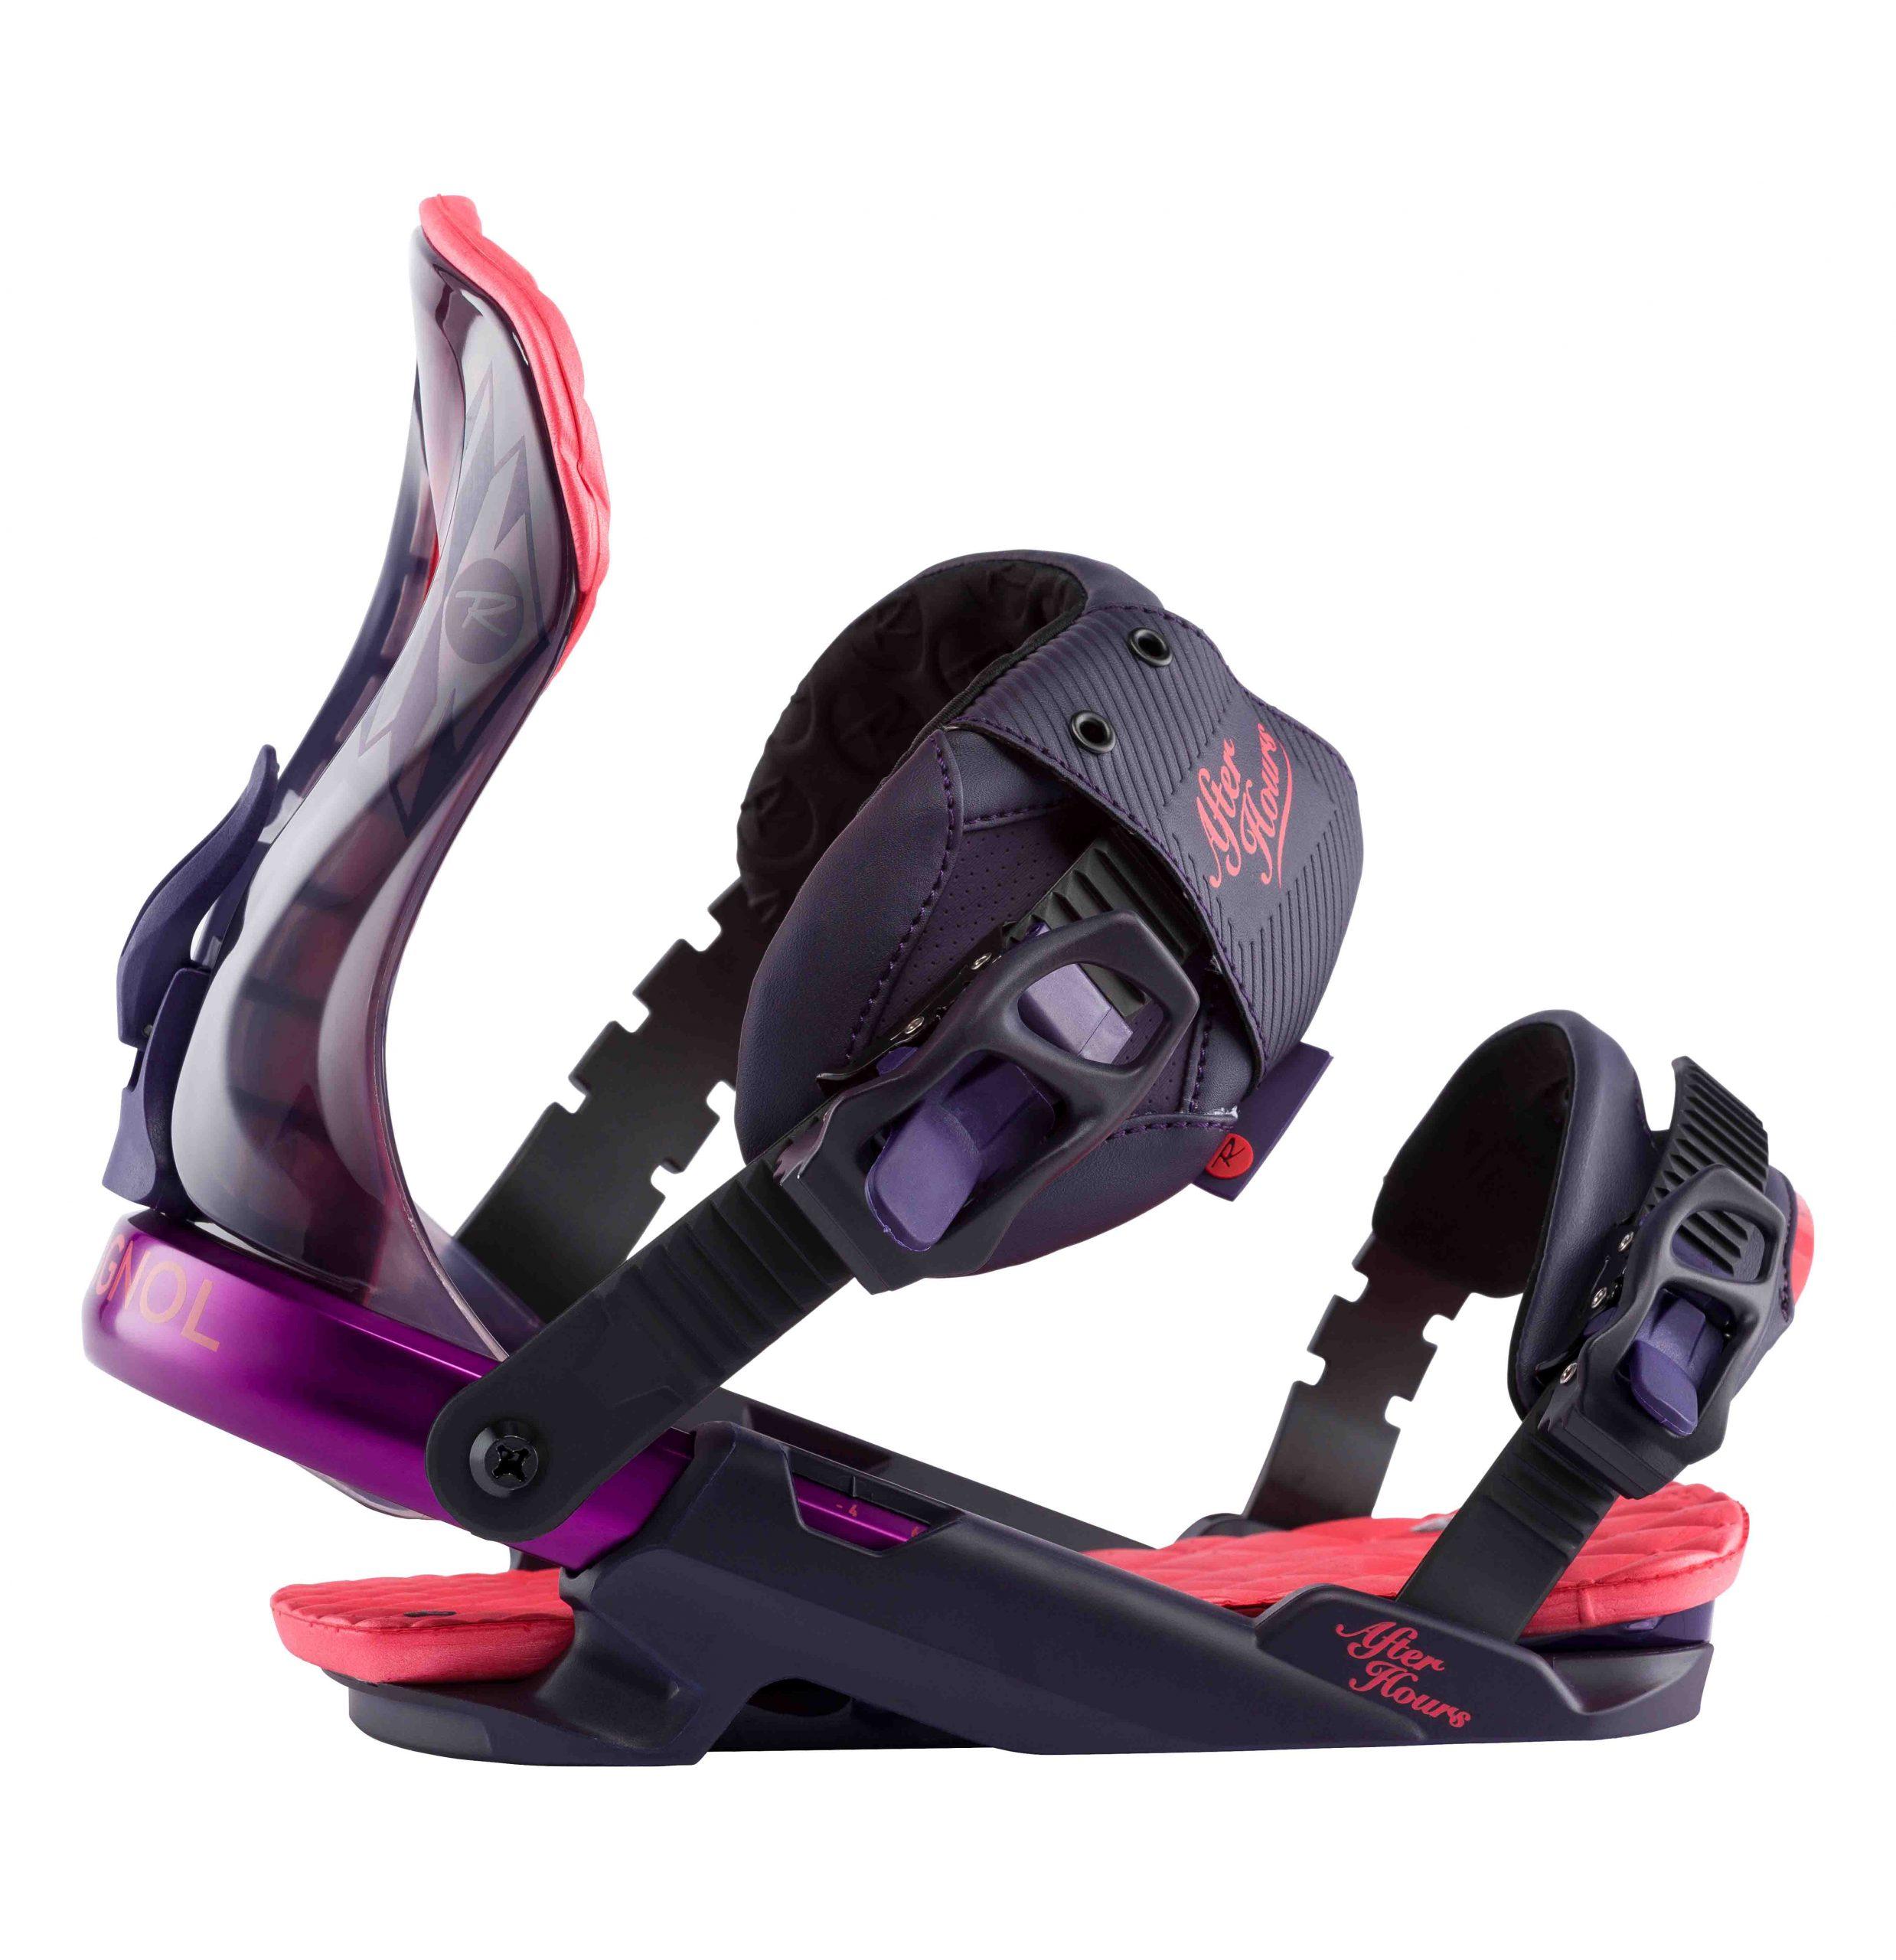 Rossignol 21/22 Snowboard Bindings